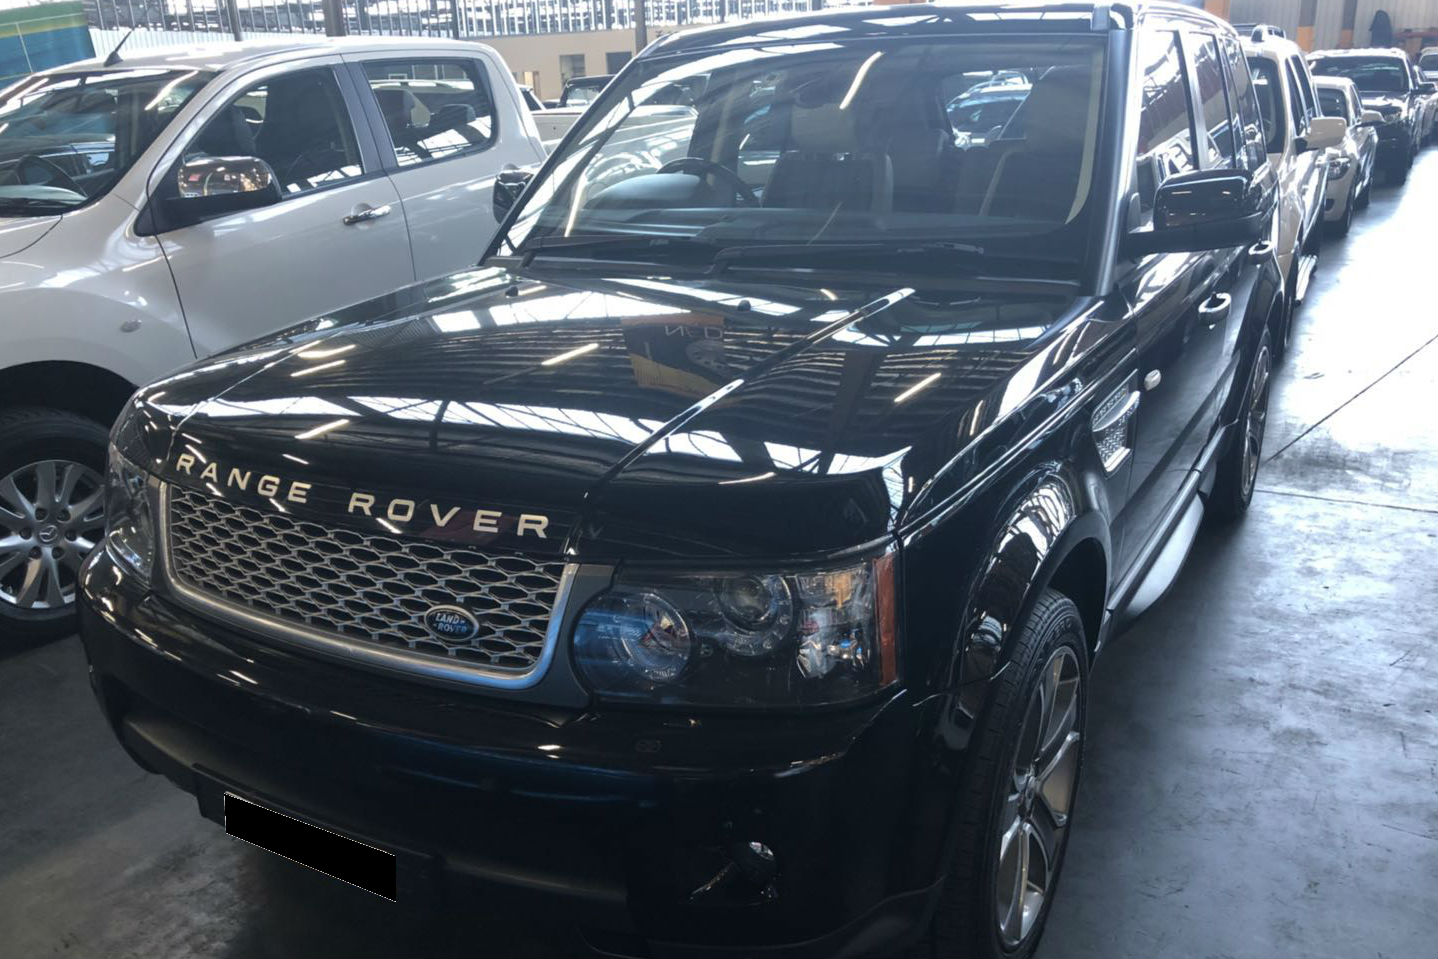 Carbar-2012-Land-Rover-Range-Rover-Sport-986620180620-114415.jpg